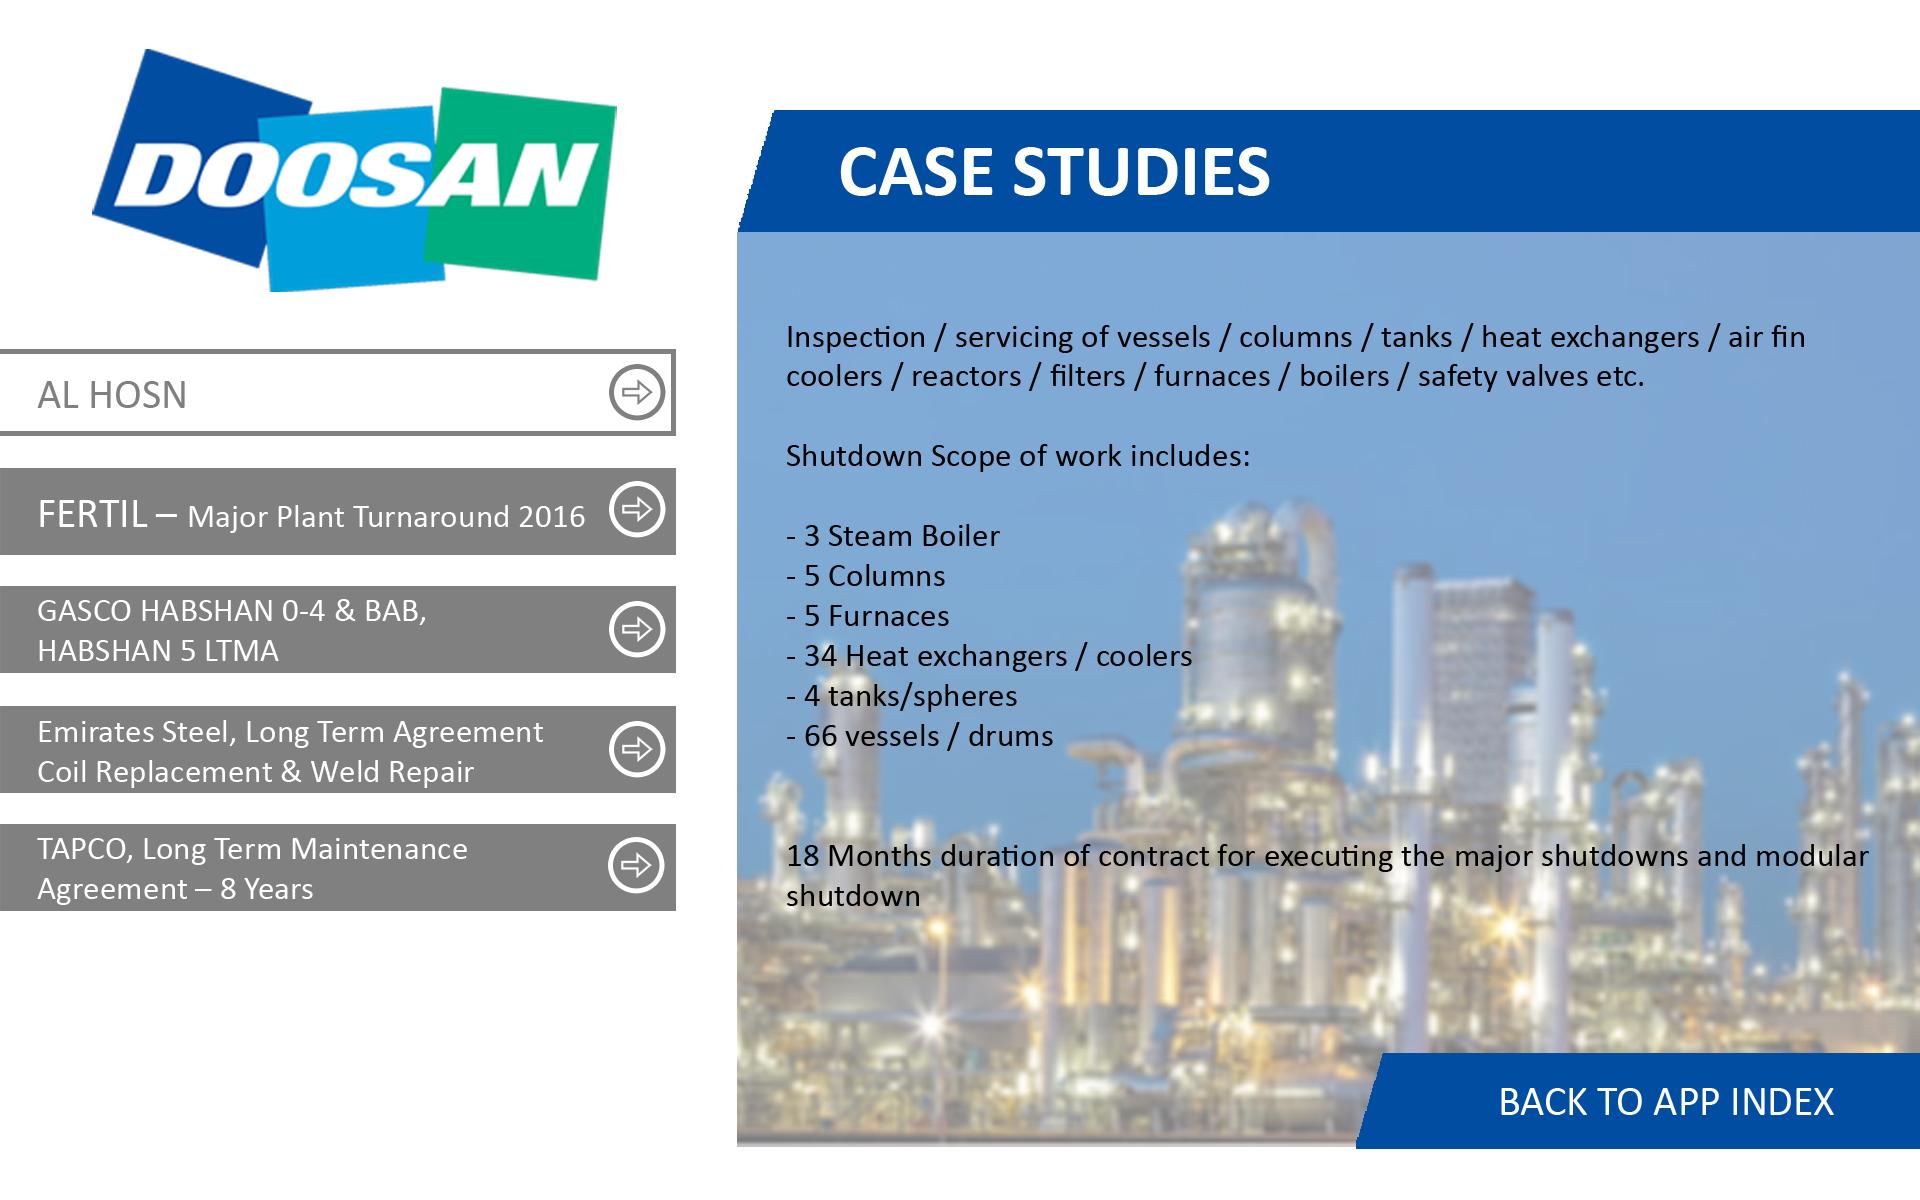 4.1-CaseStudy-AL-HOSN.png